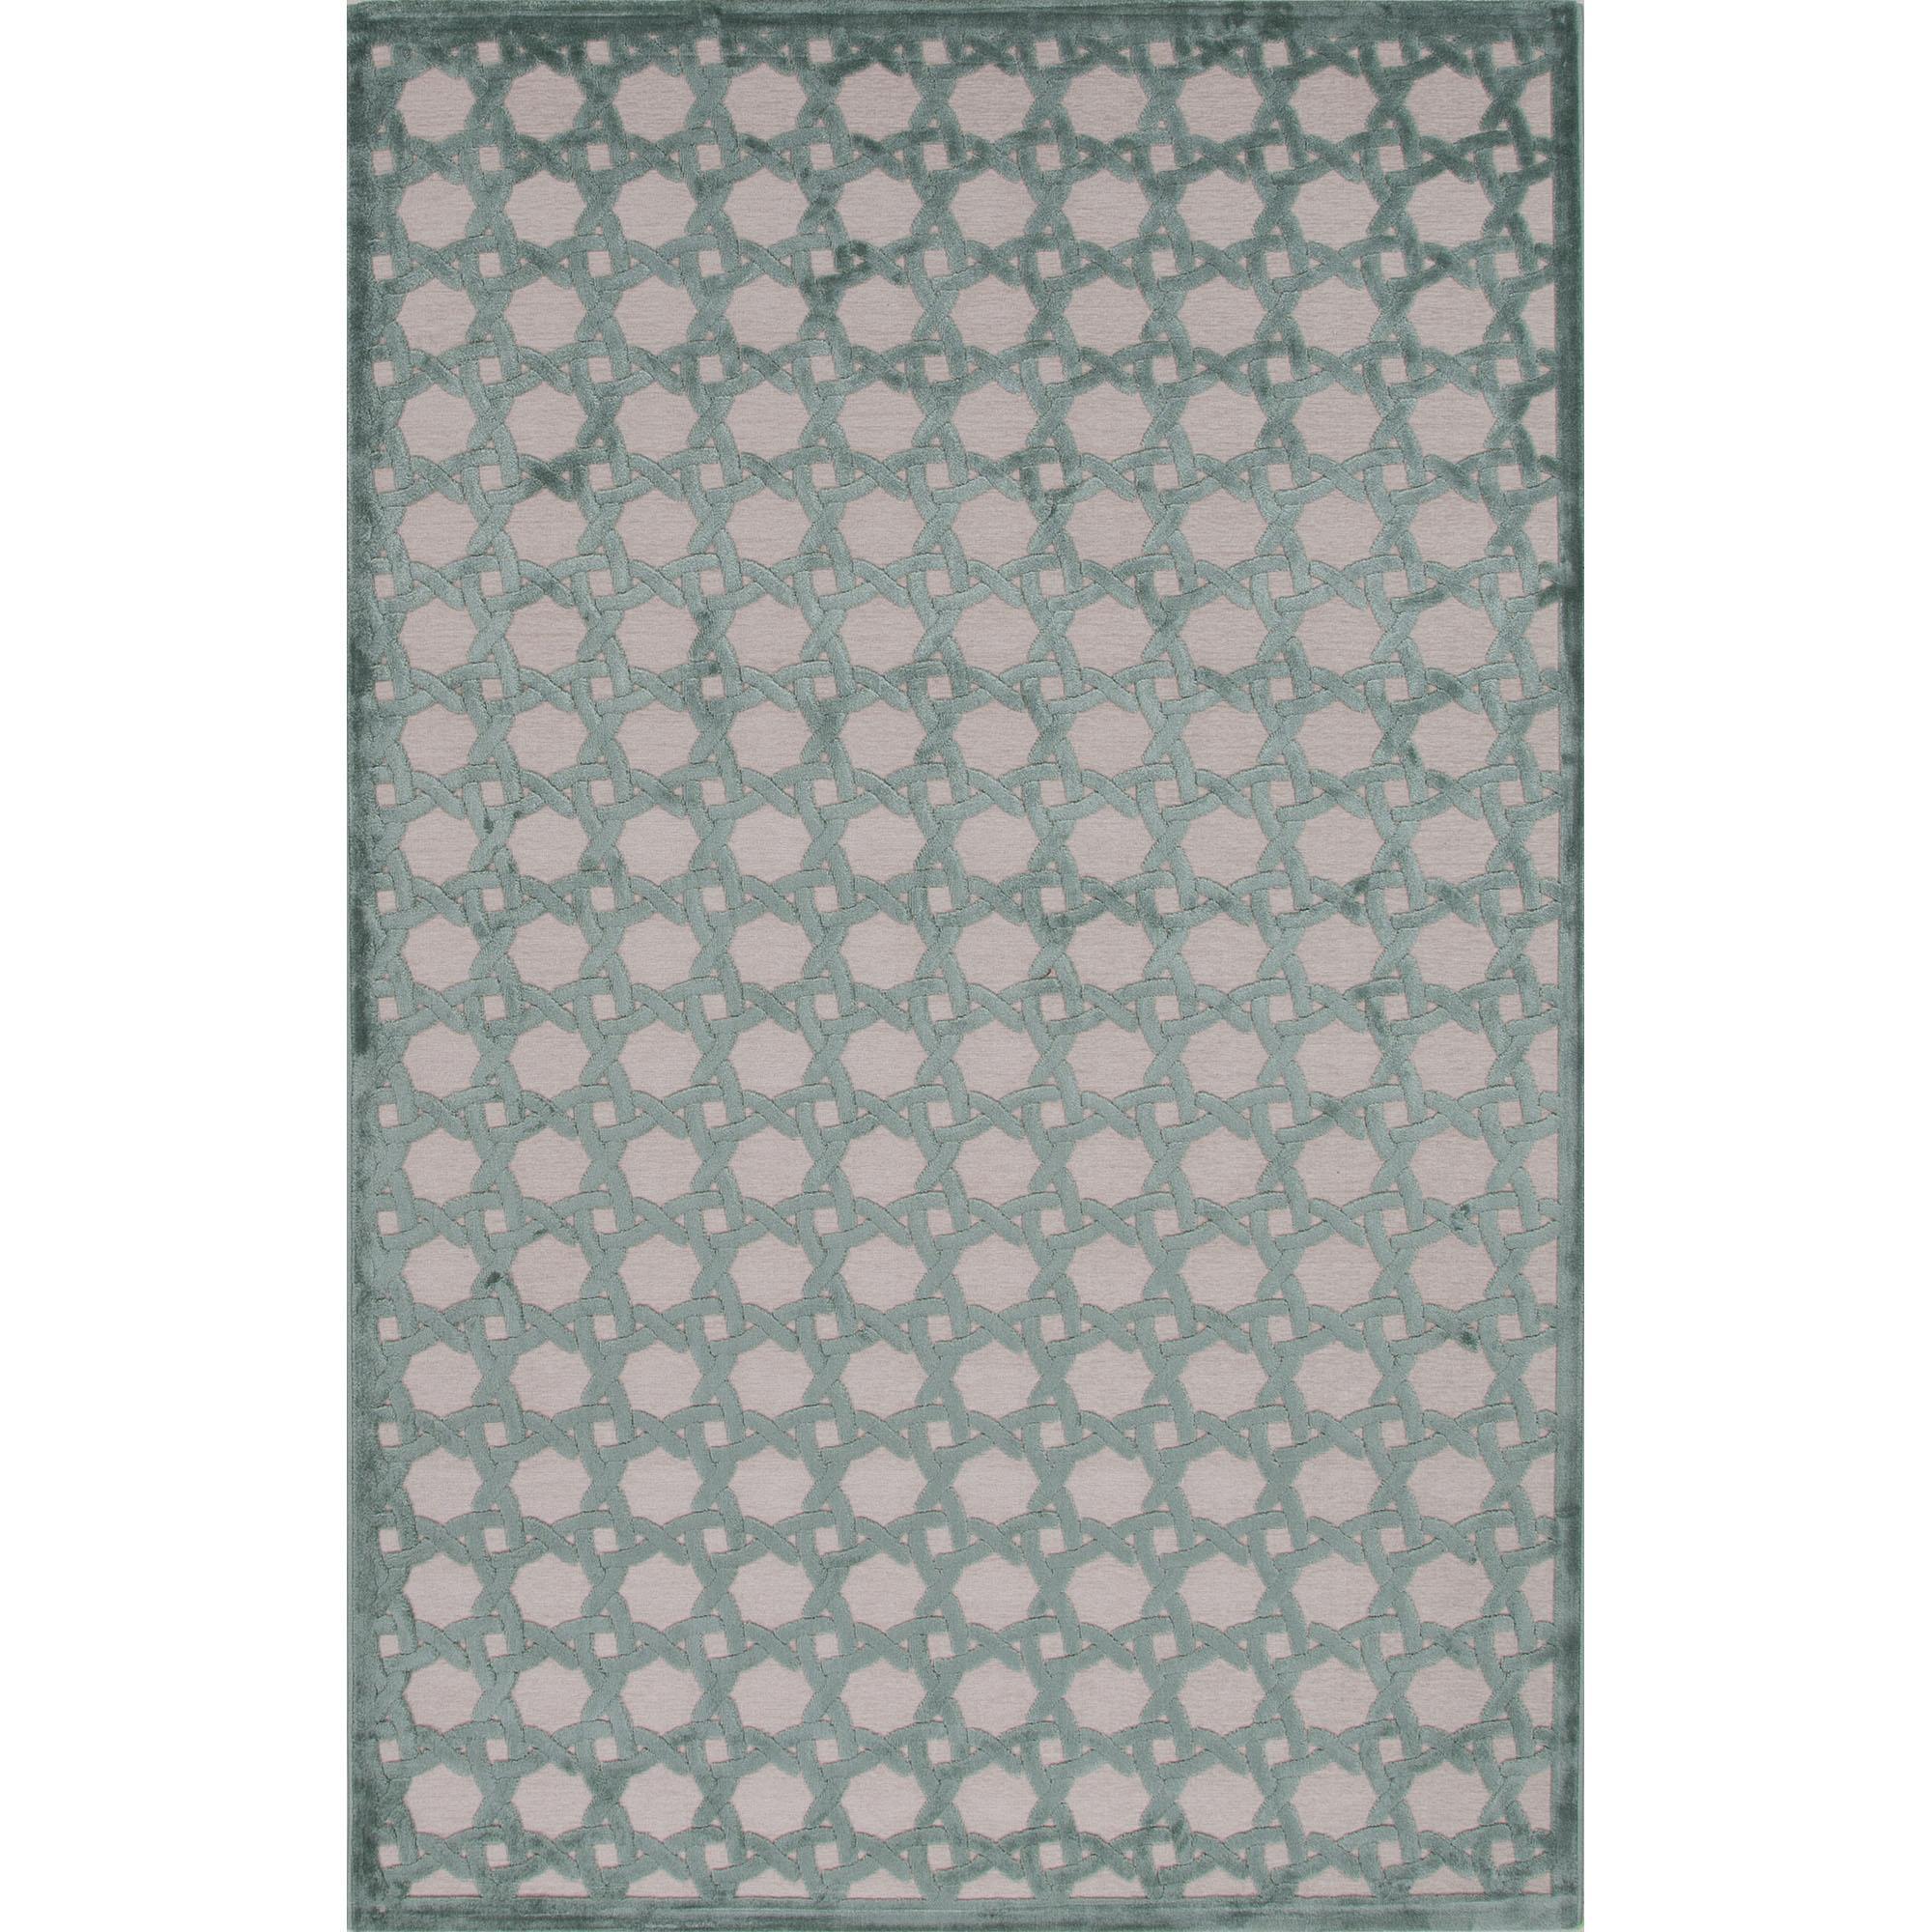 JAIPUR Rugs Fables 9 x 12 Rug - Item Number: RUG121811